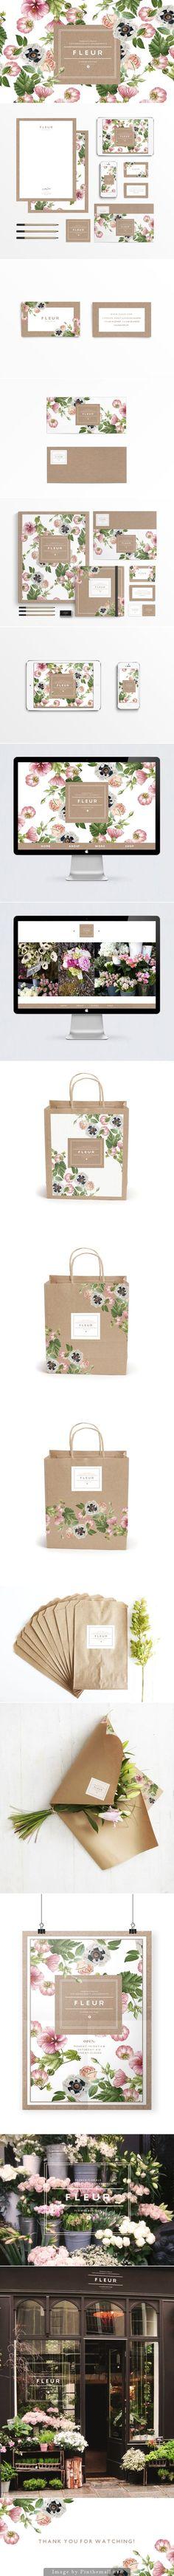 How beautiful is Fleur #identity #packaging #branding curated by Packaging Diva PD created via https://www.behance.net/gallery/15892001/F-L-E-U-R: